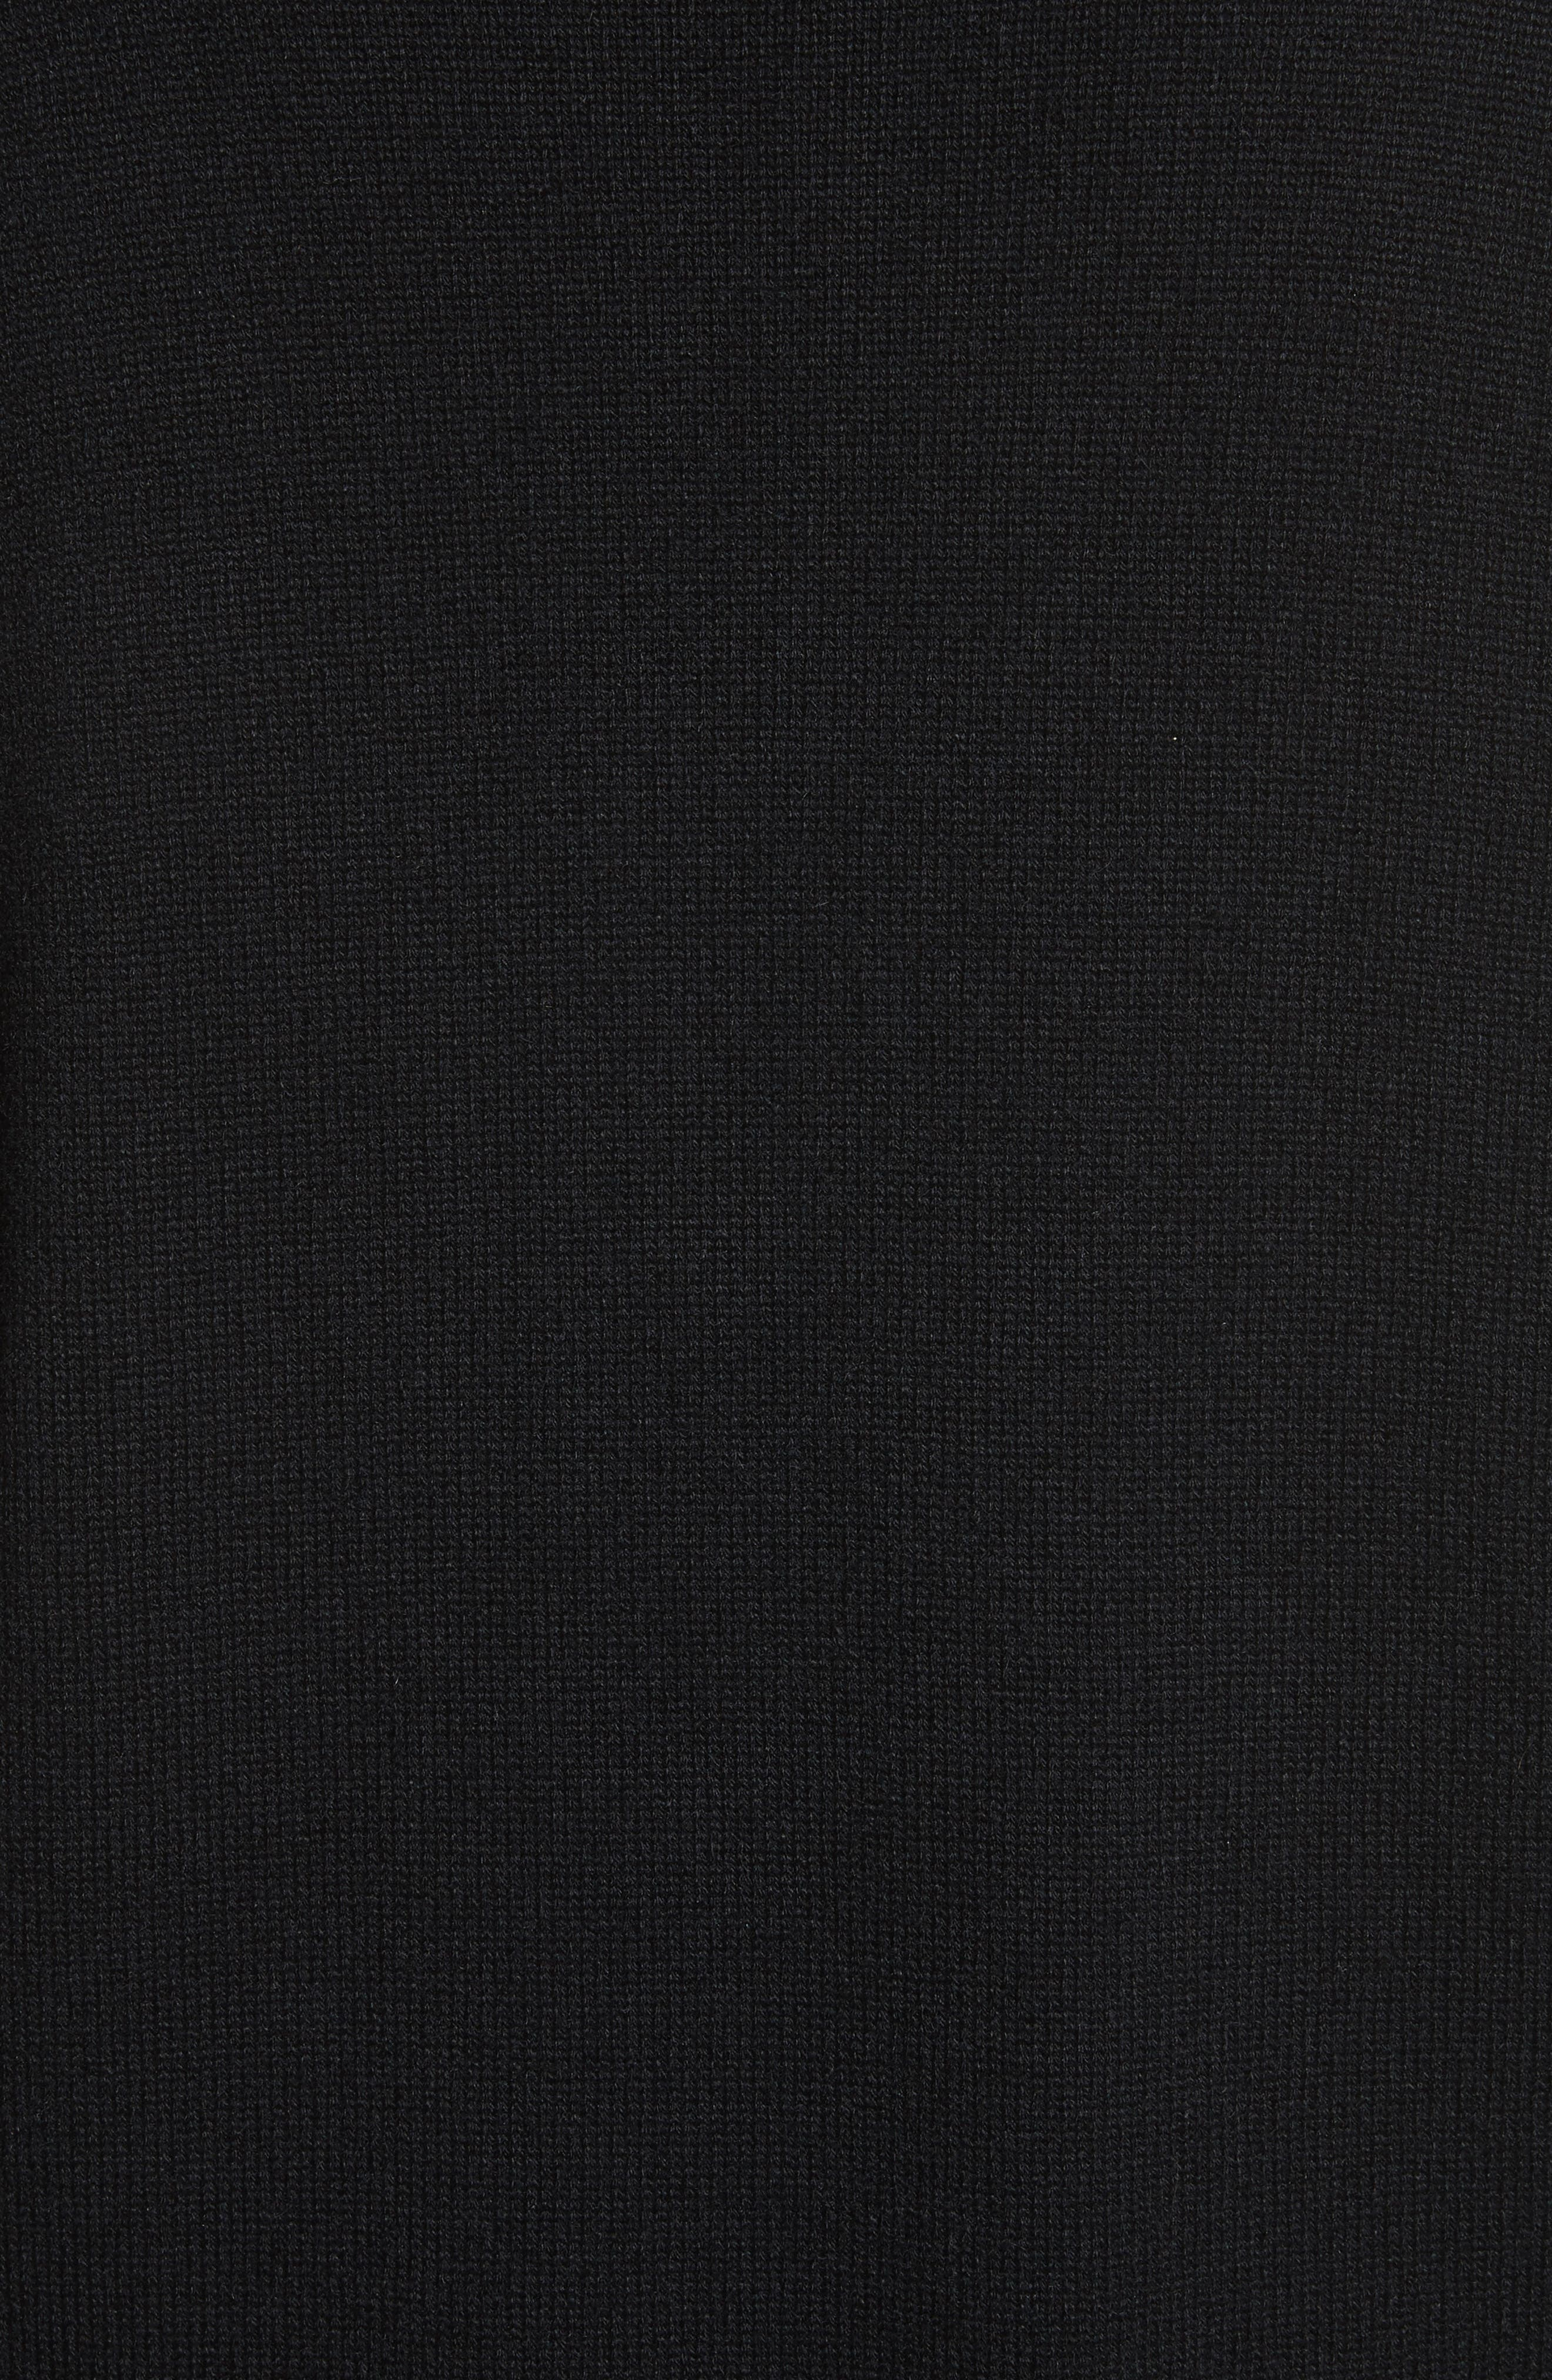 Embellished Cashmere Tunic,                             Alternate thumbnail 5, color,                             001